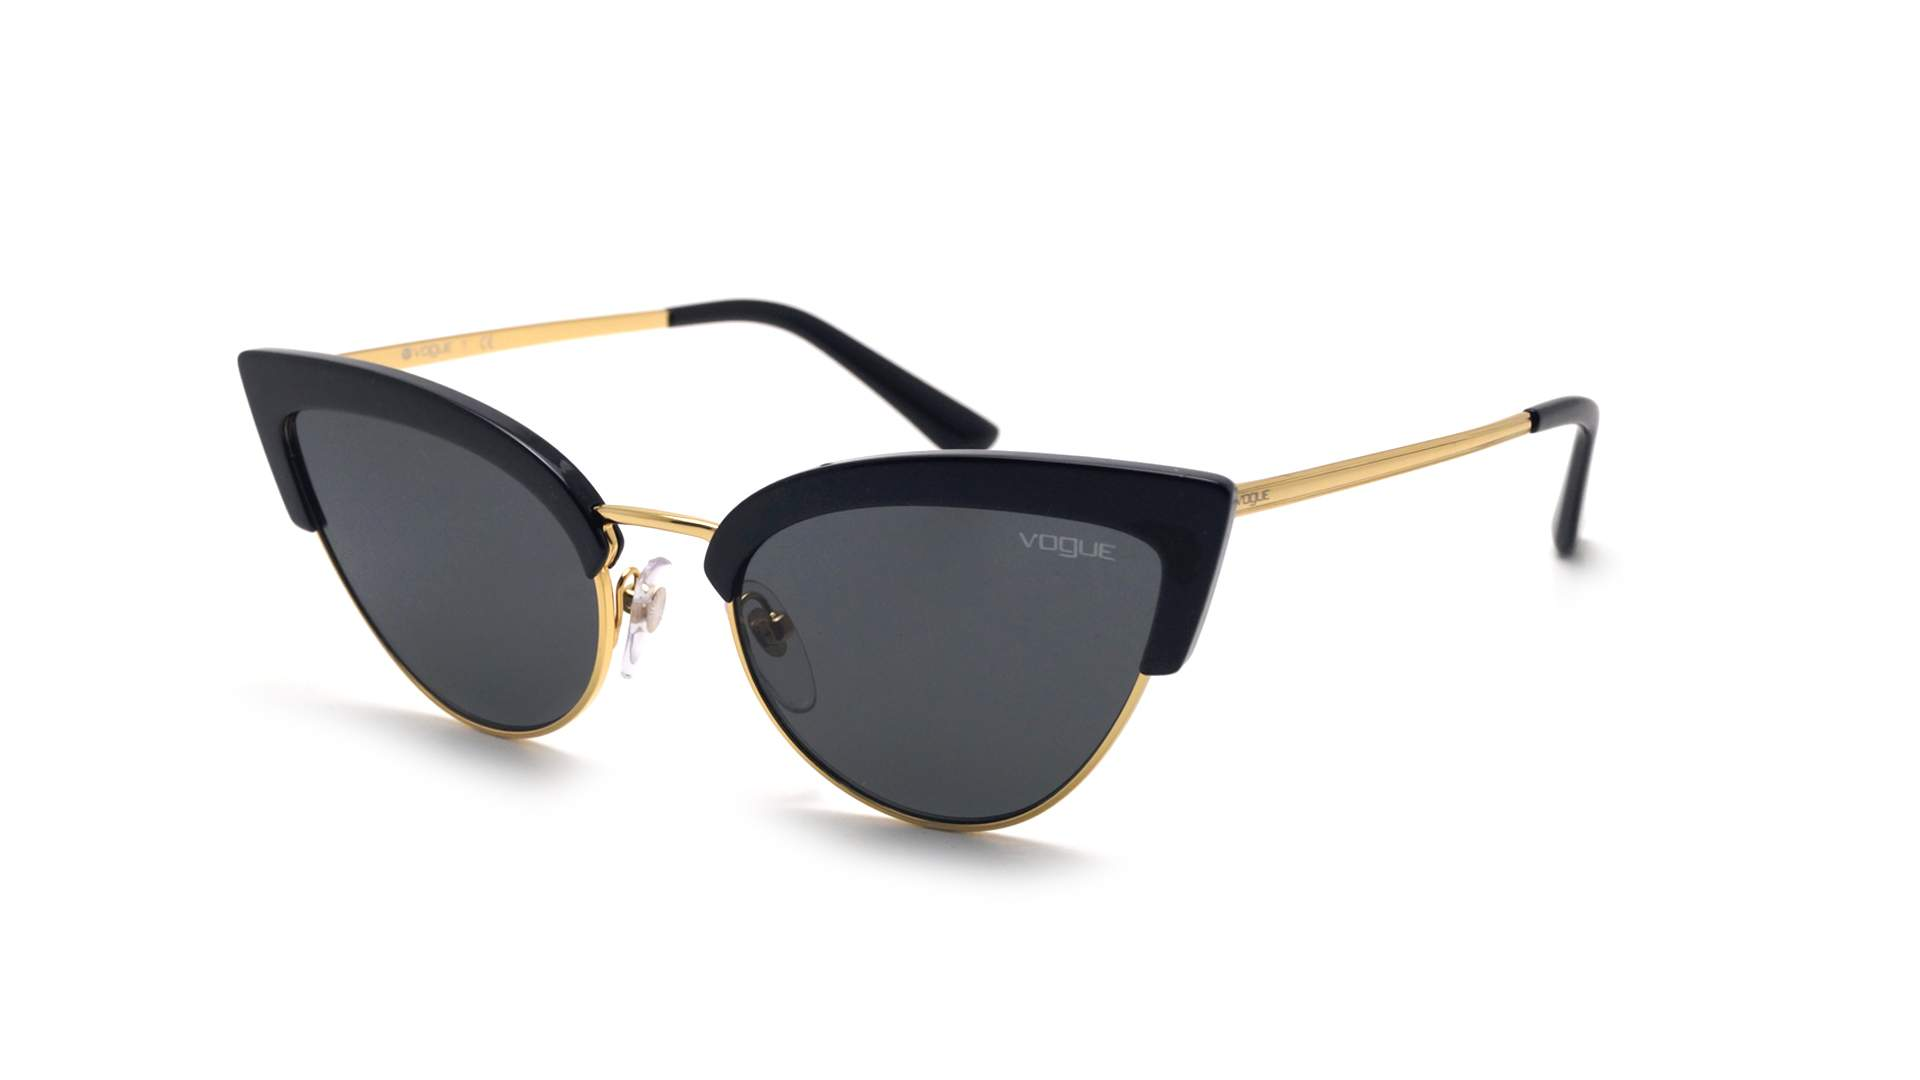 Sunglasses Vogue Retro glam Gold VO5212S W44 87 55-19 Medium 20b3f53962